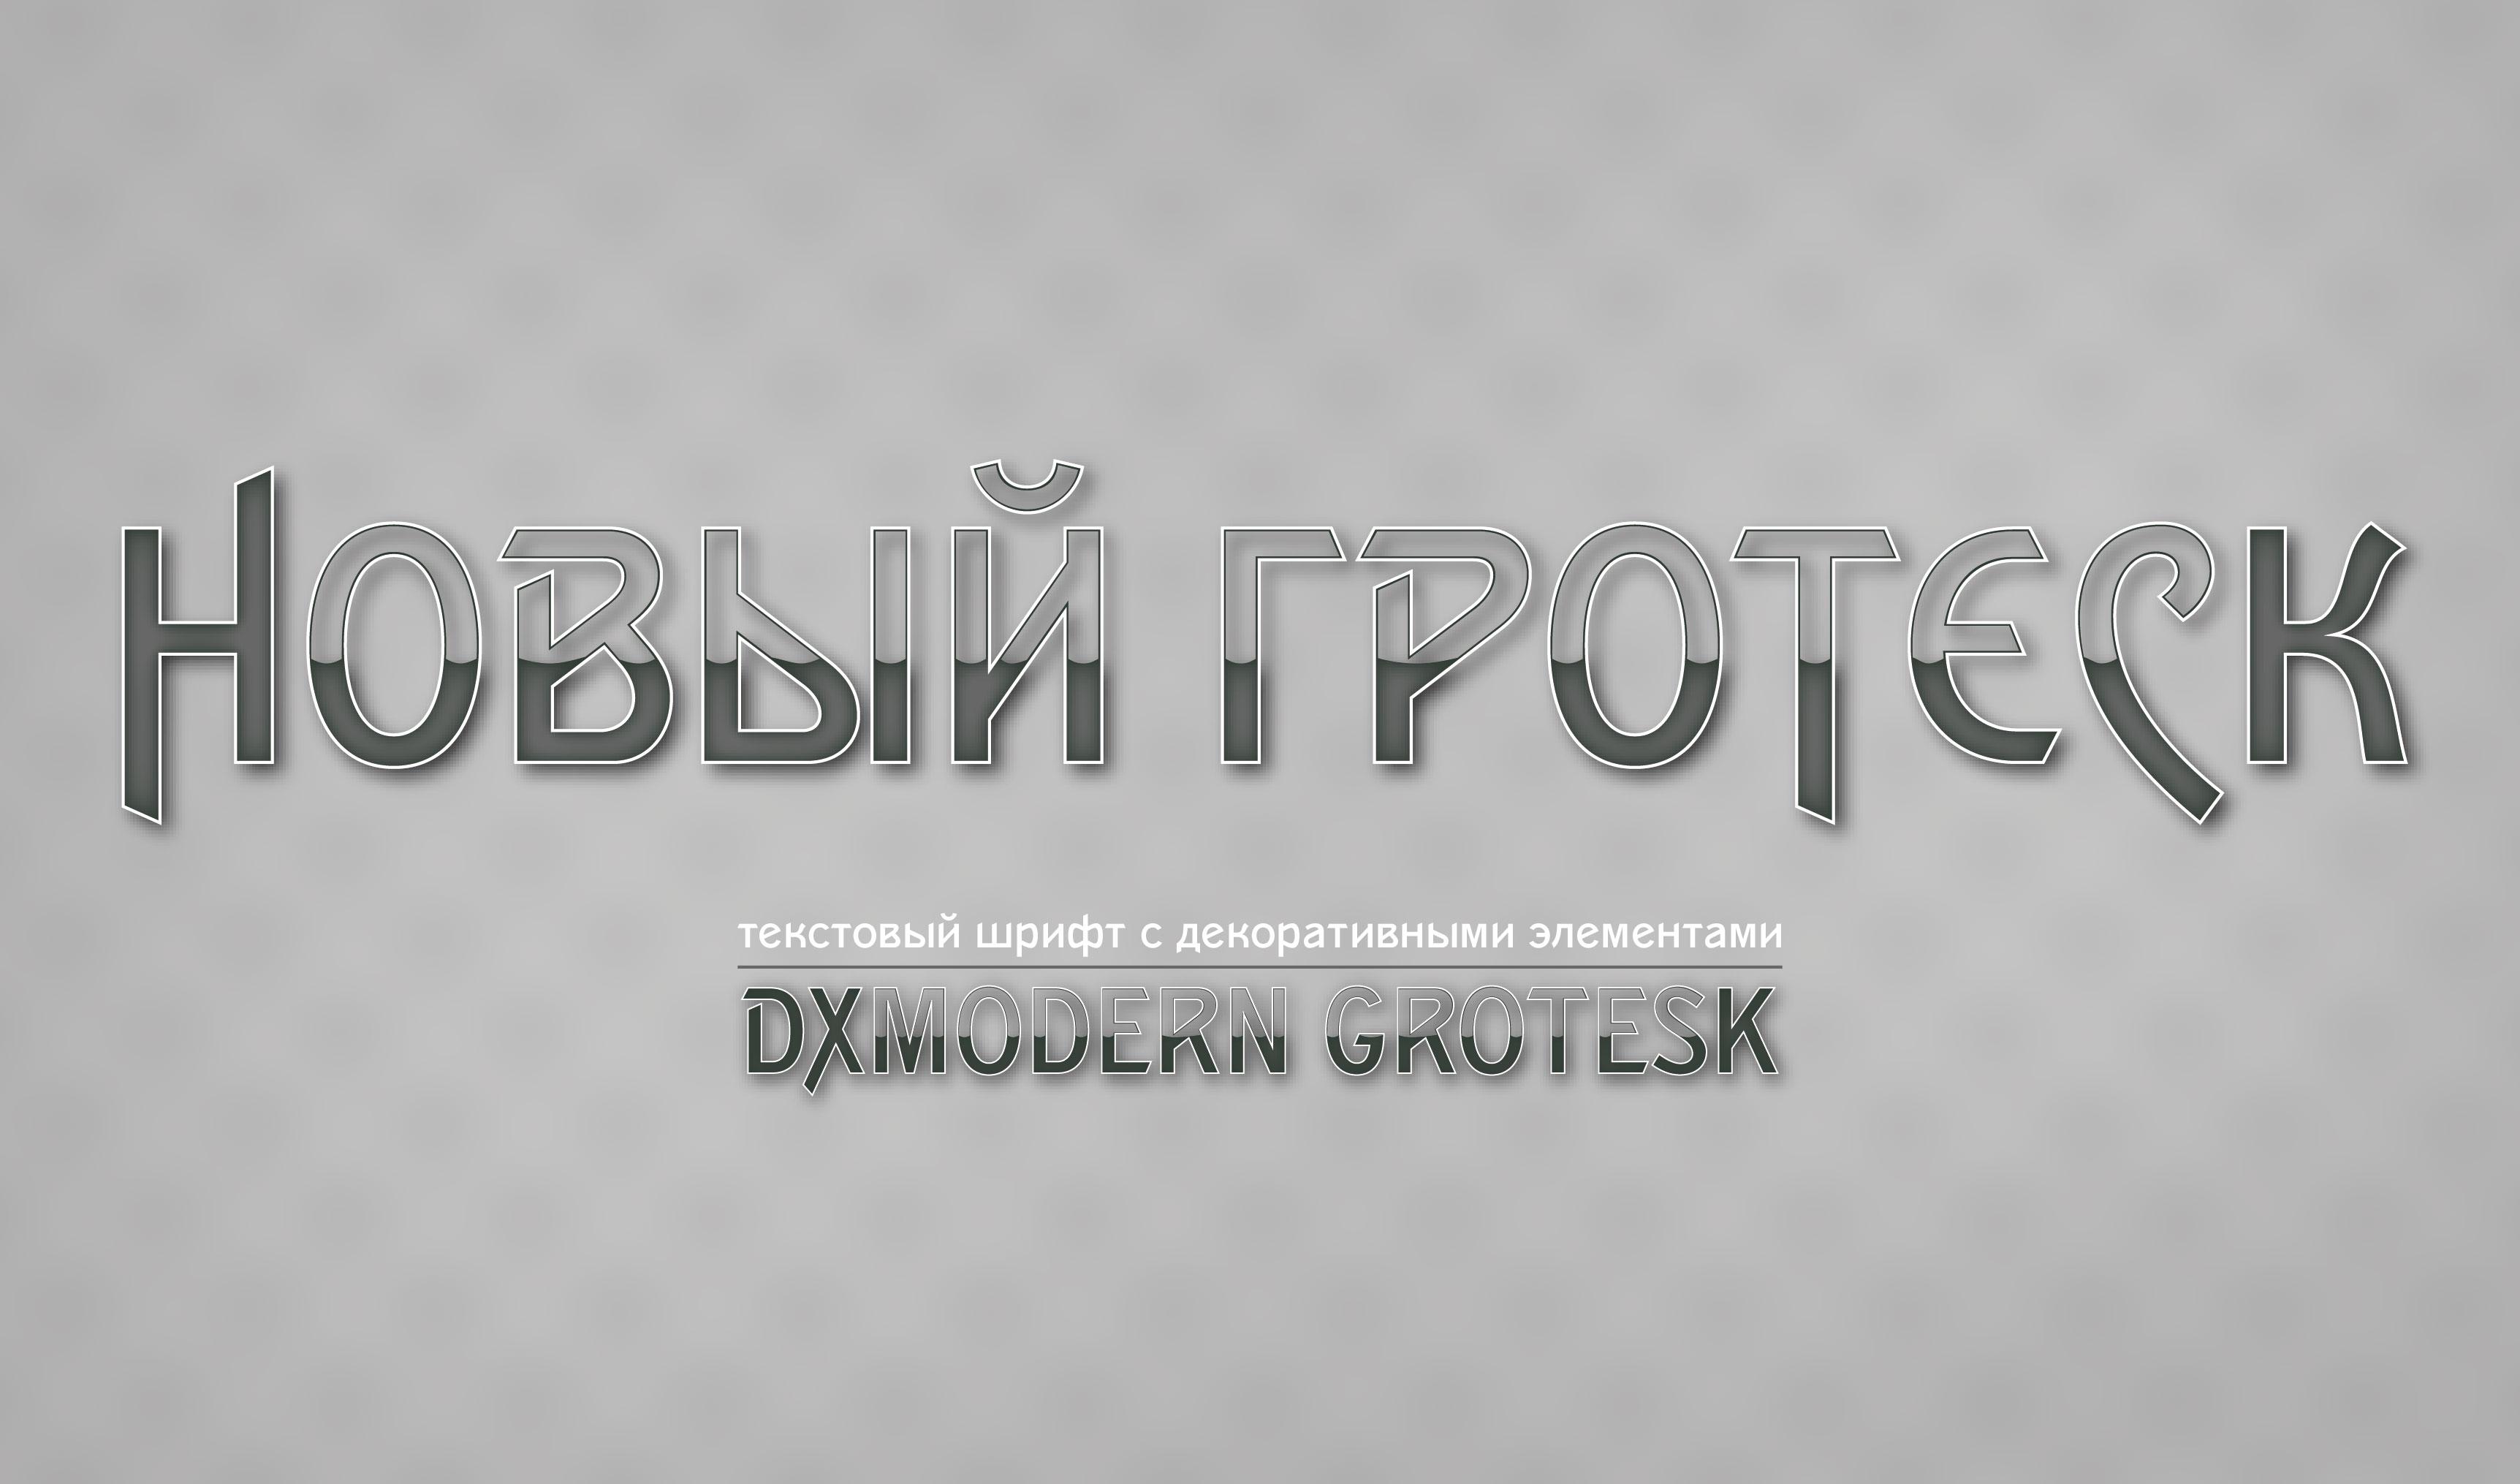 DXModernGrotesk